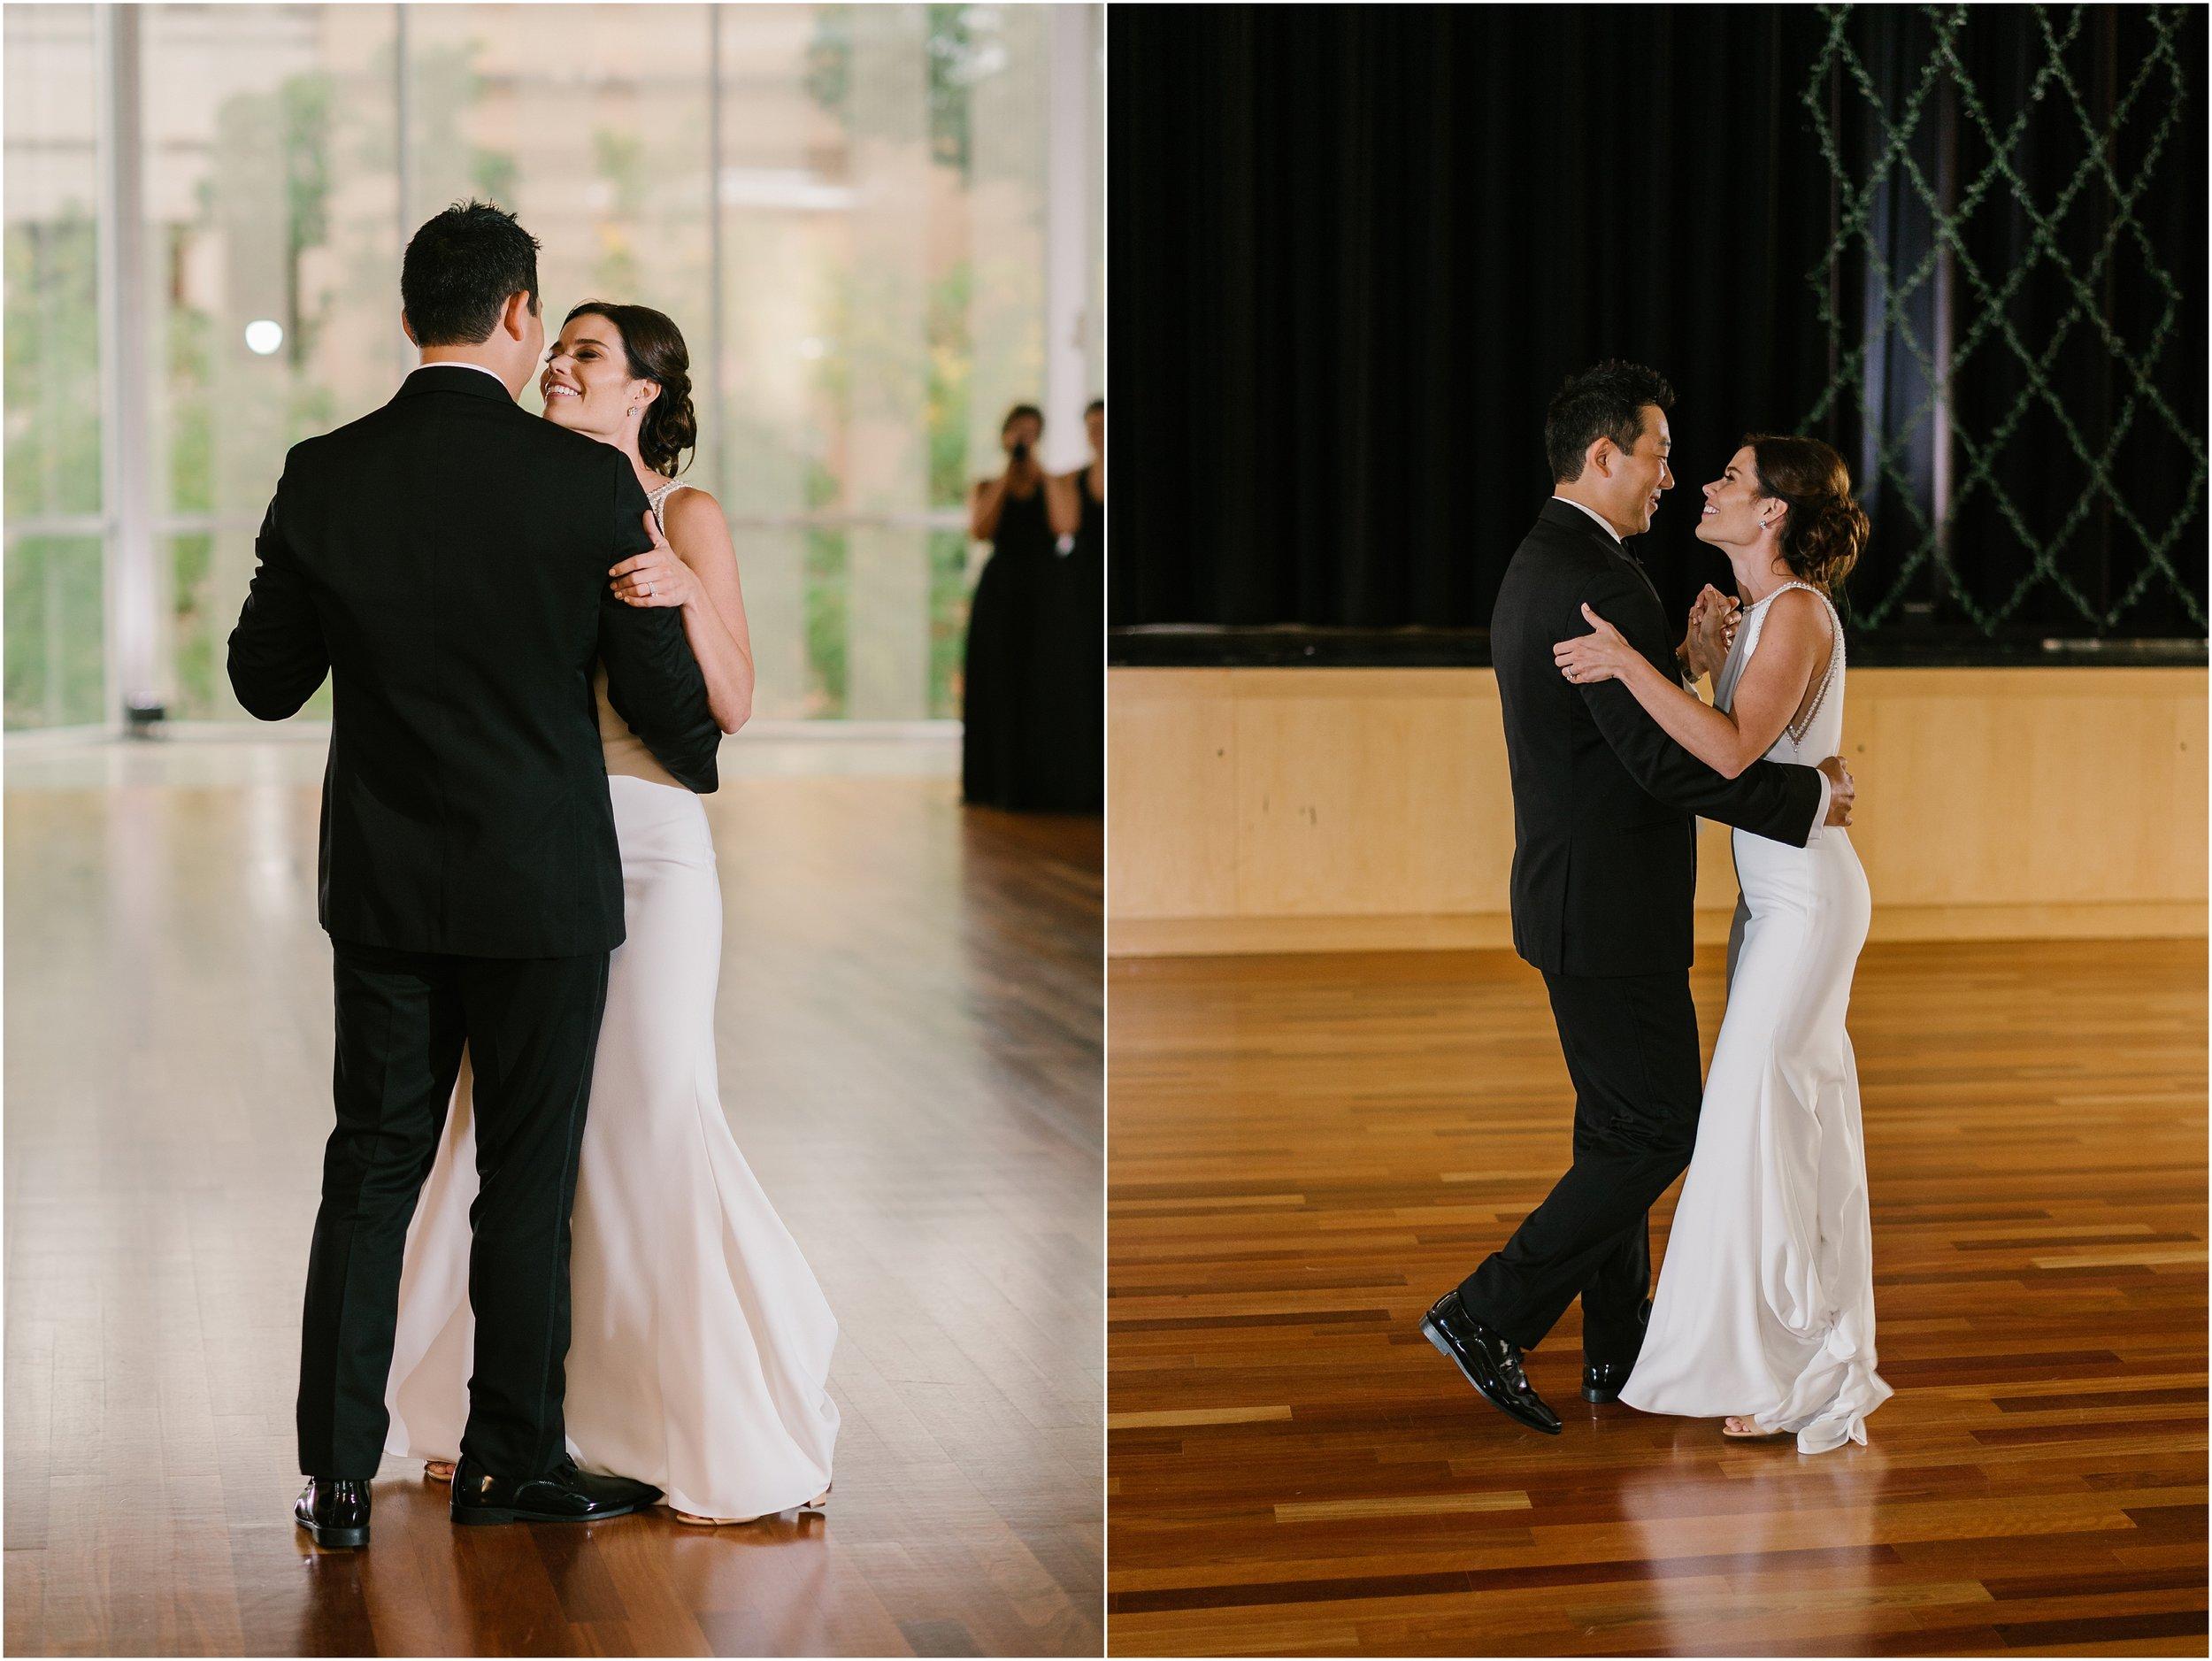 Rebecca_Shehorn_Photography_Indianapolis Wedding Photographer Sycamore at Mallow Run Wedding_9764.jpg